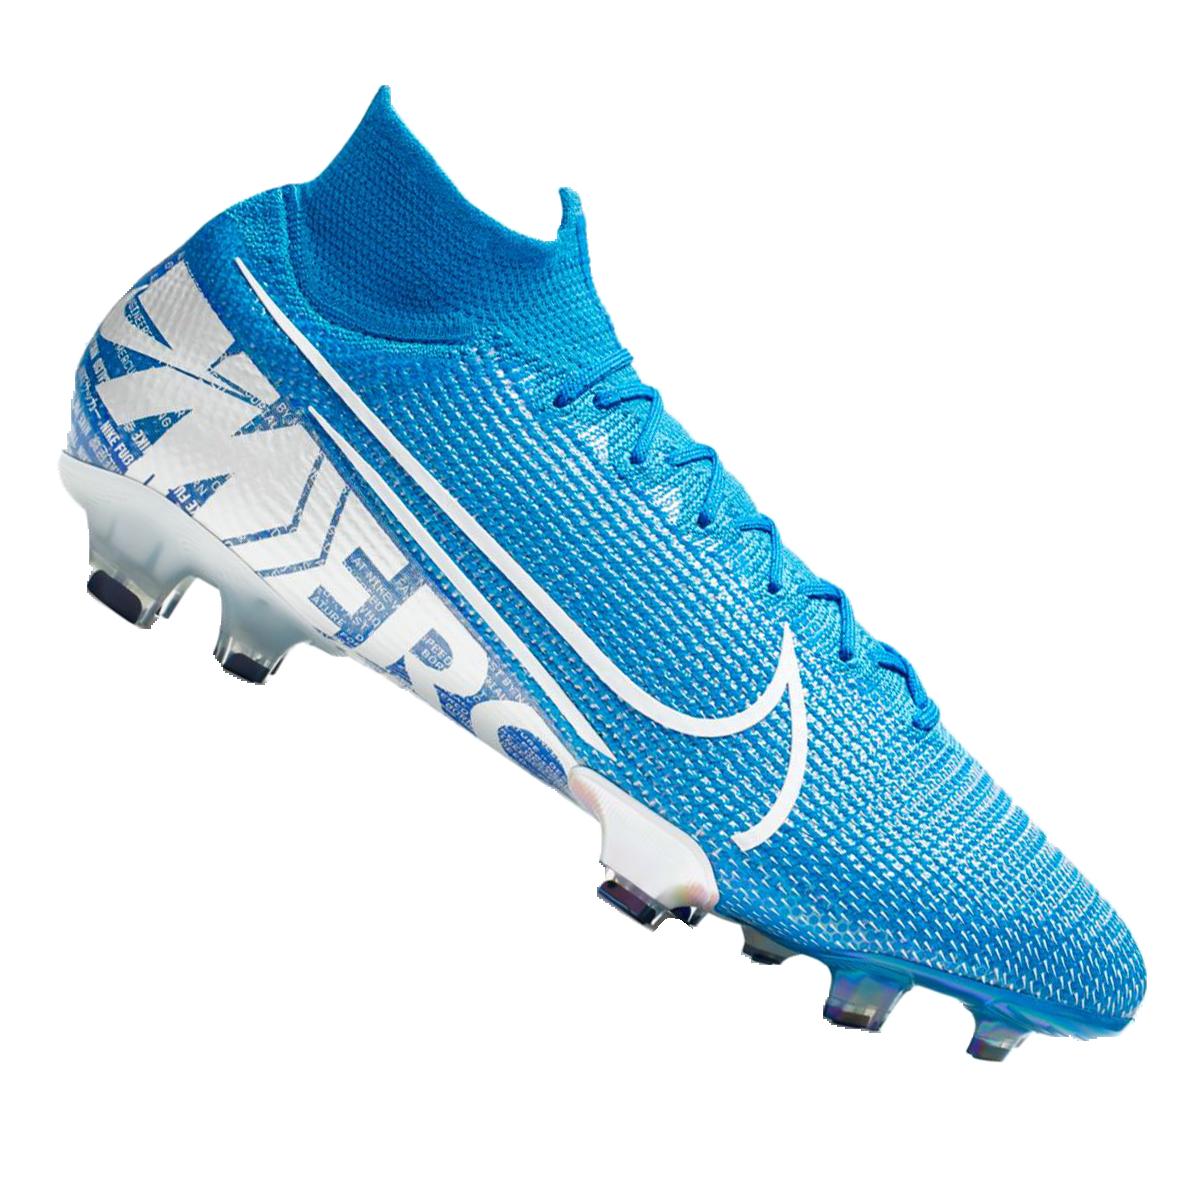 Nike Fußballschuh Mercurial Superfly VII Elite FG hellblauweiß